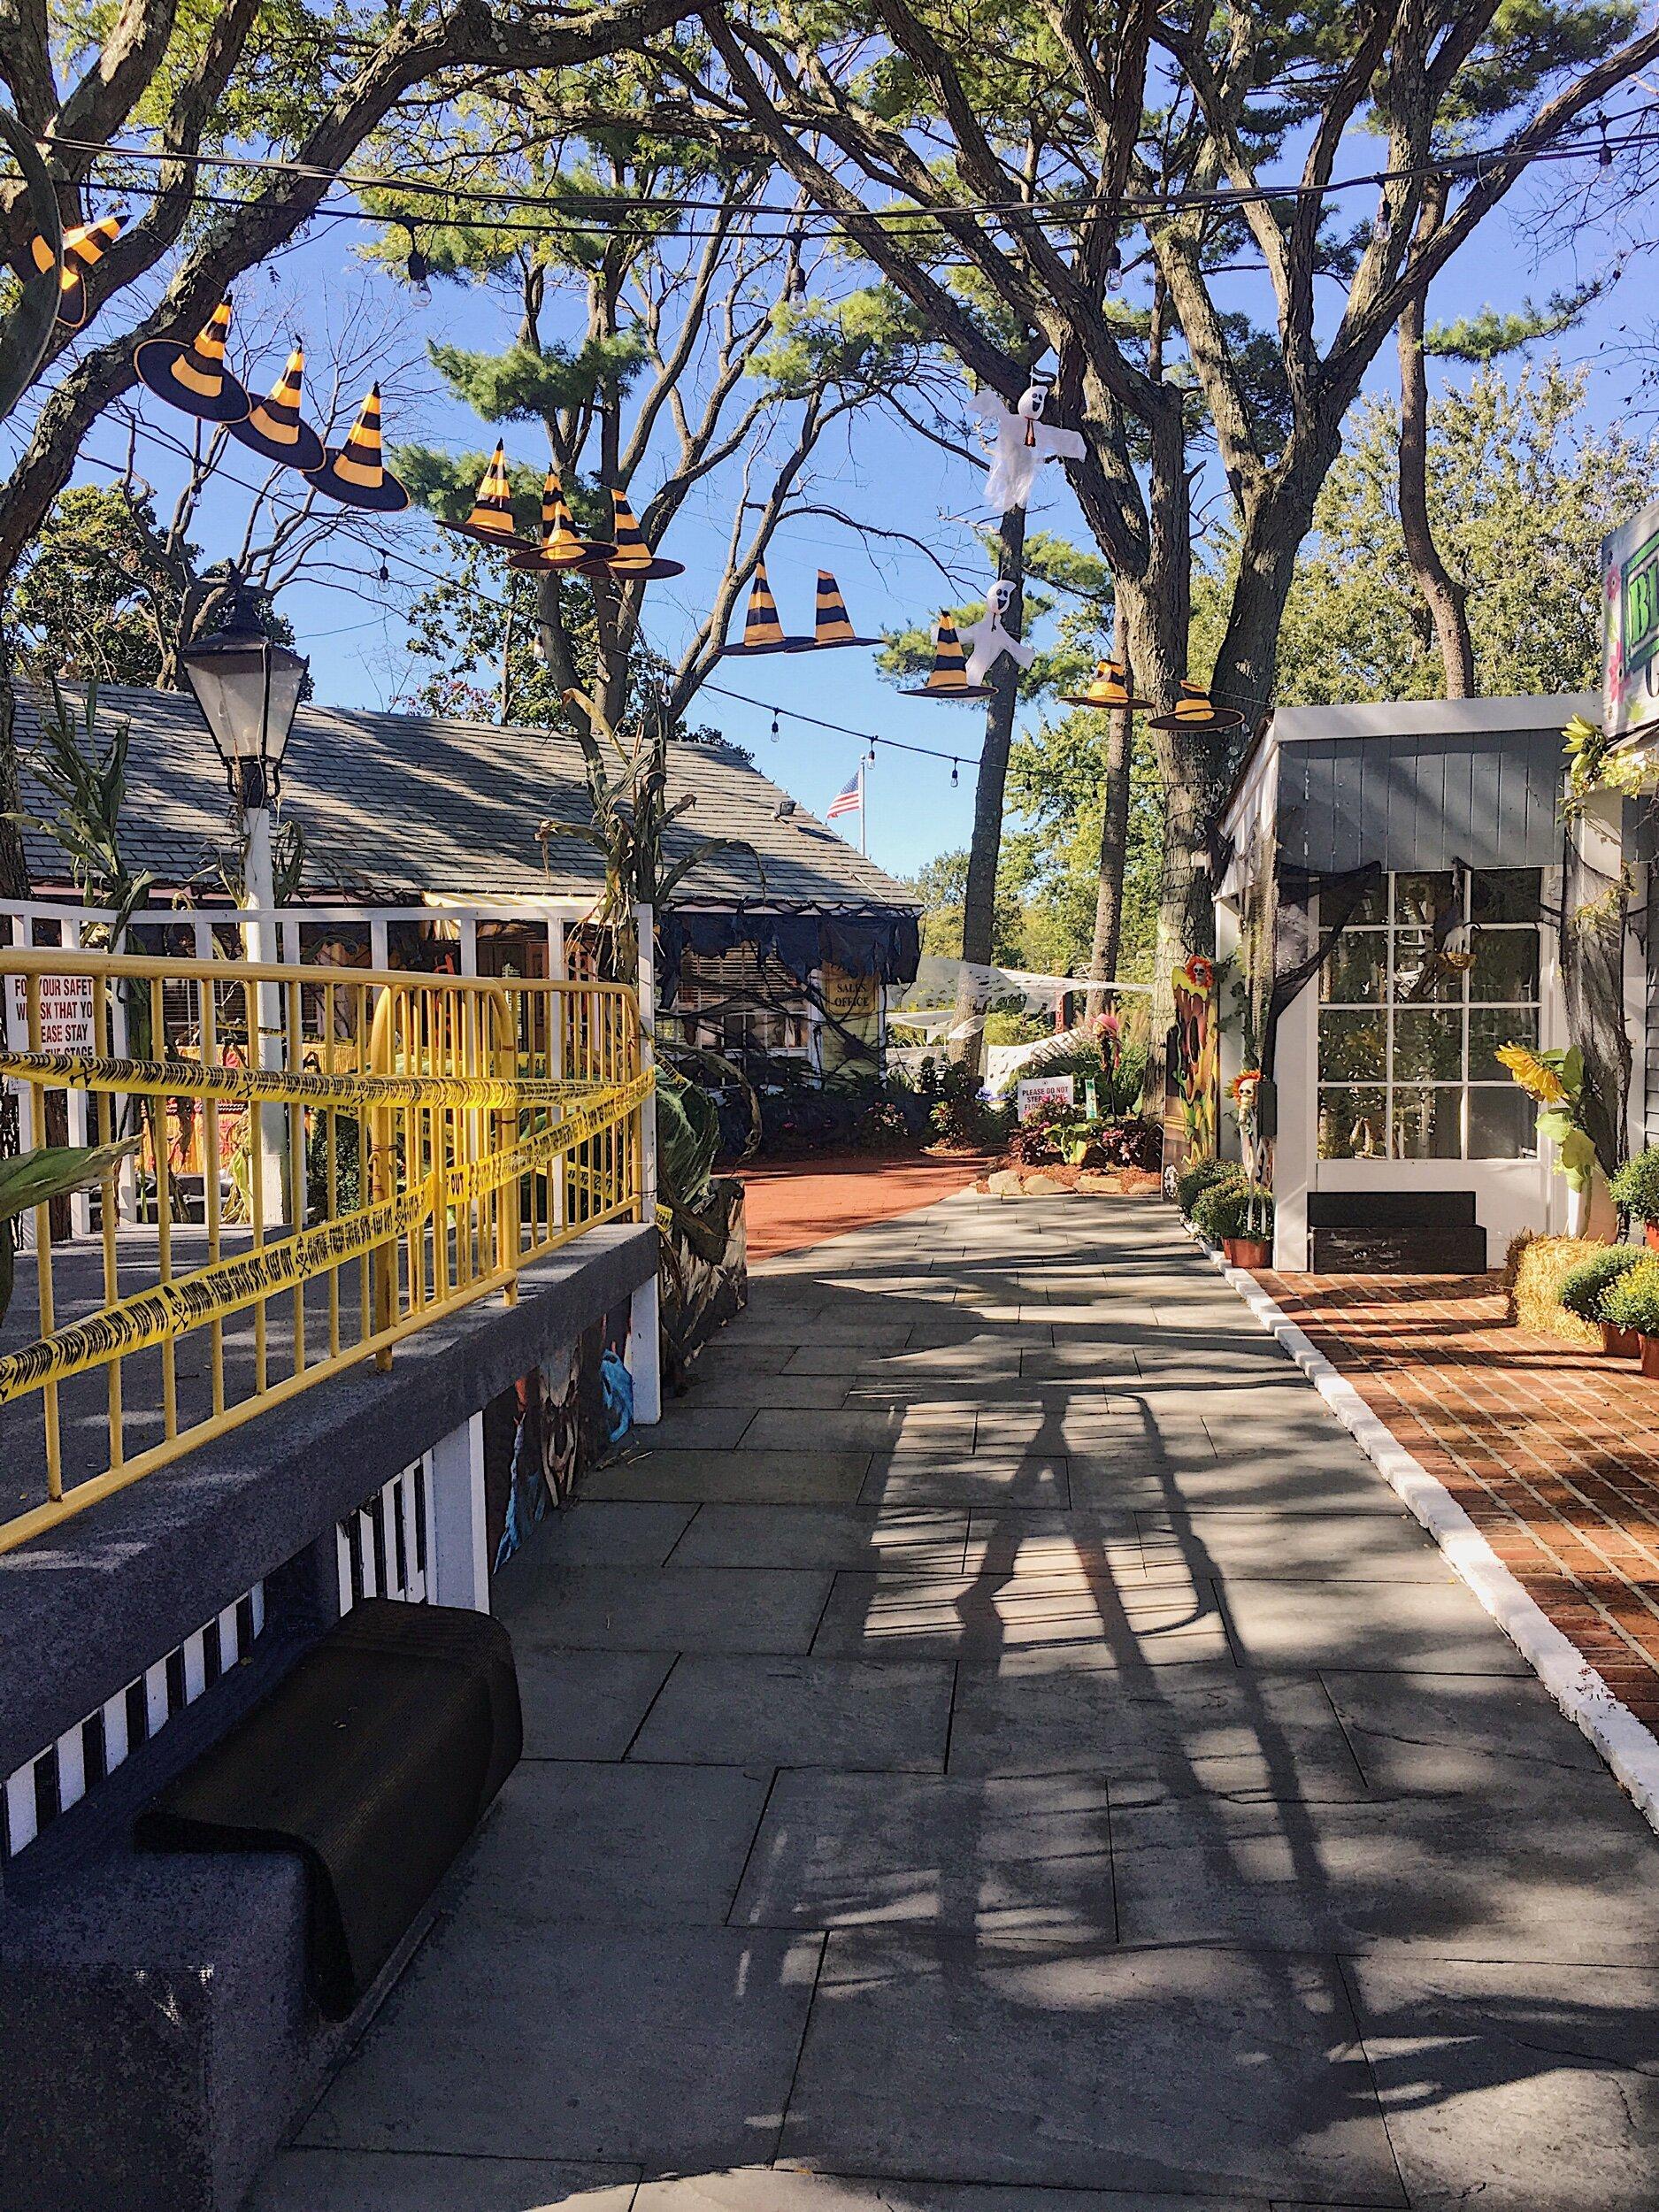 Walking down the Main Street of Milleridge Village